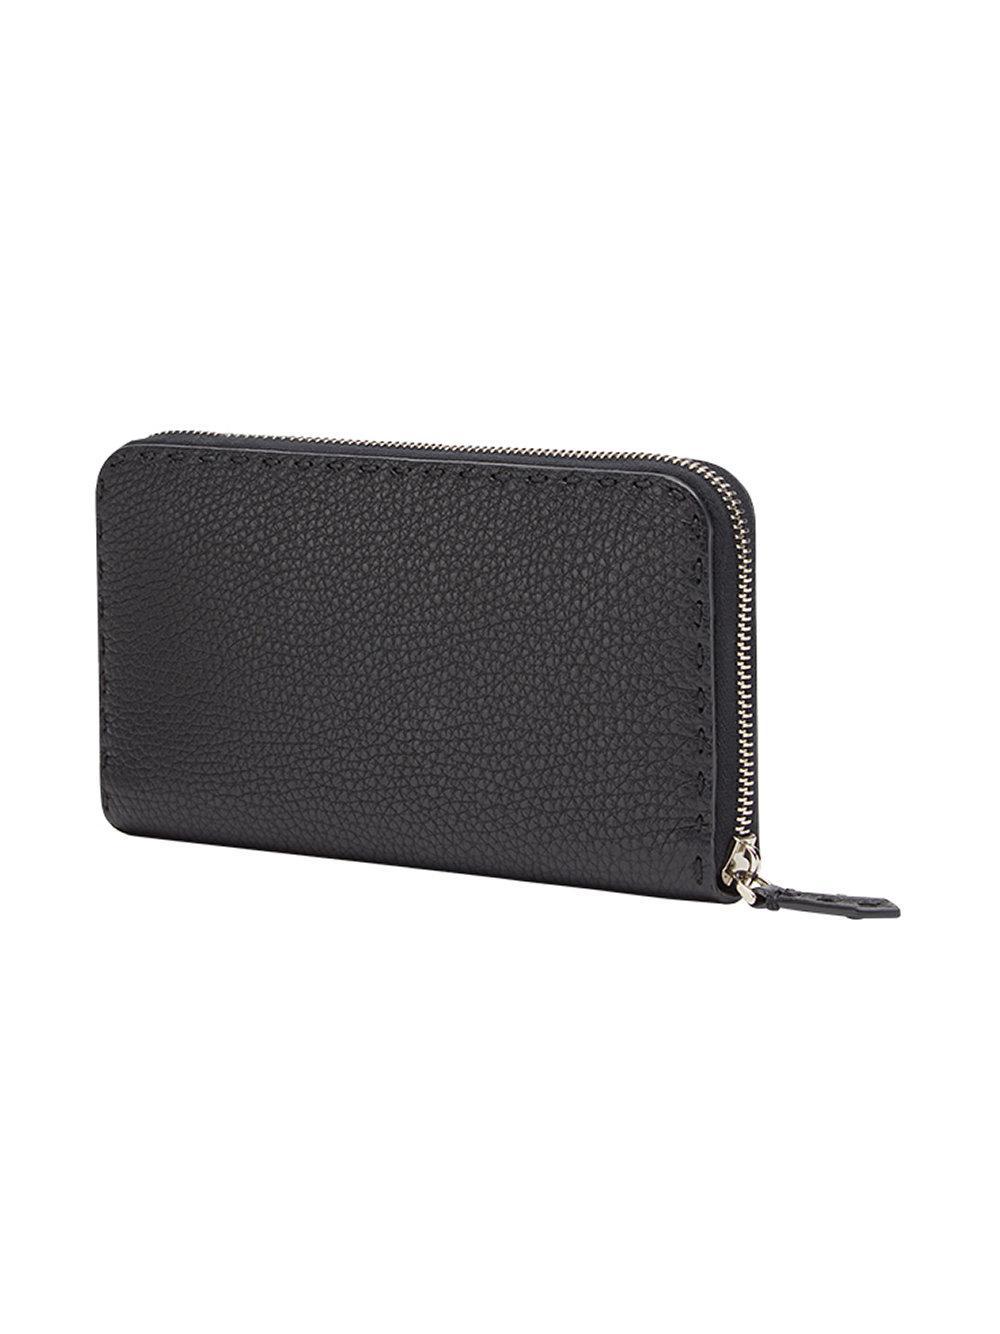 63cdfe5dd1a0 Fendi Selleria Continental Wallet in Black for Men - Lyst